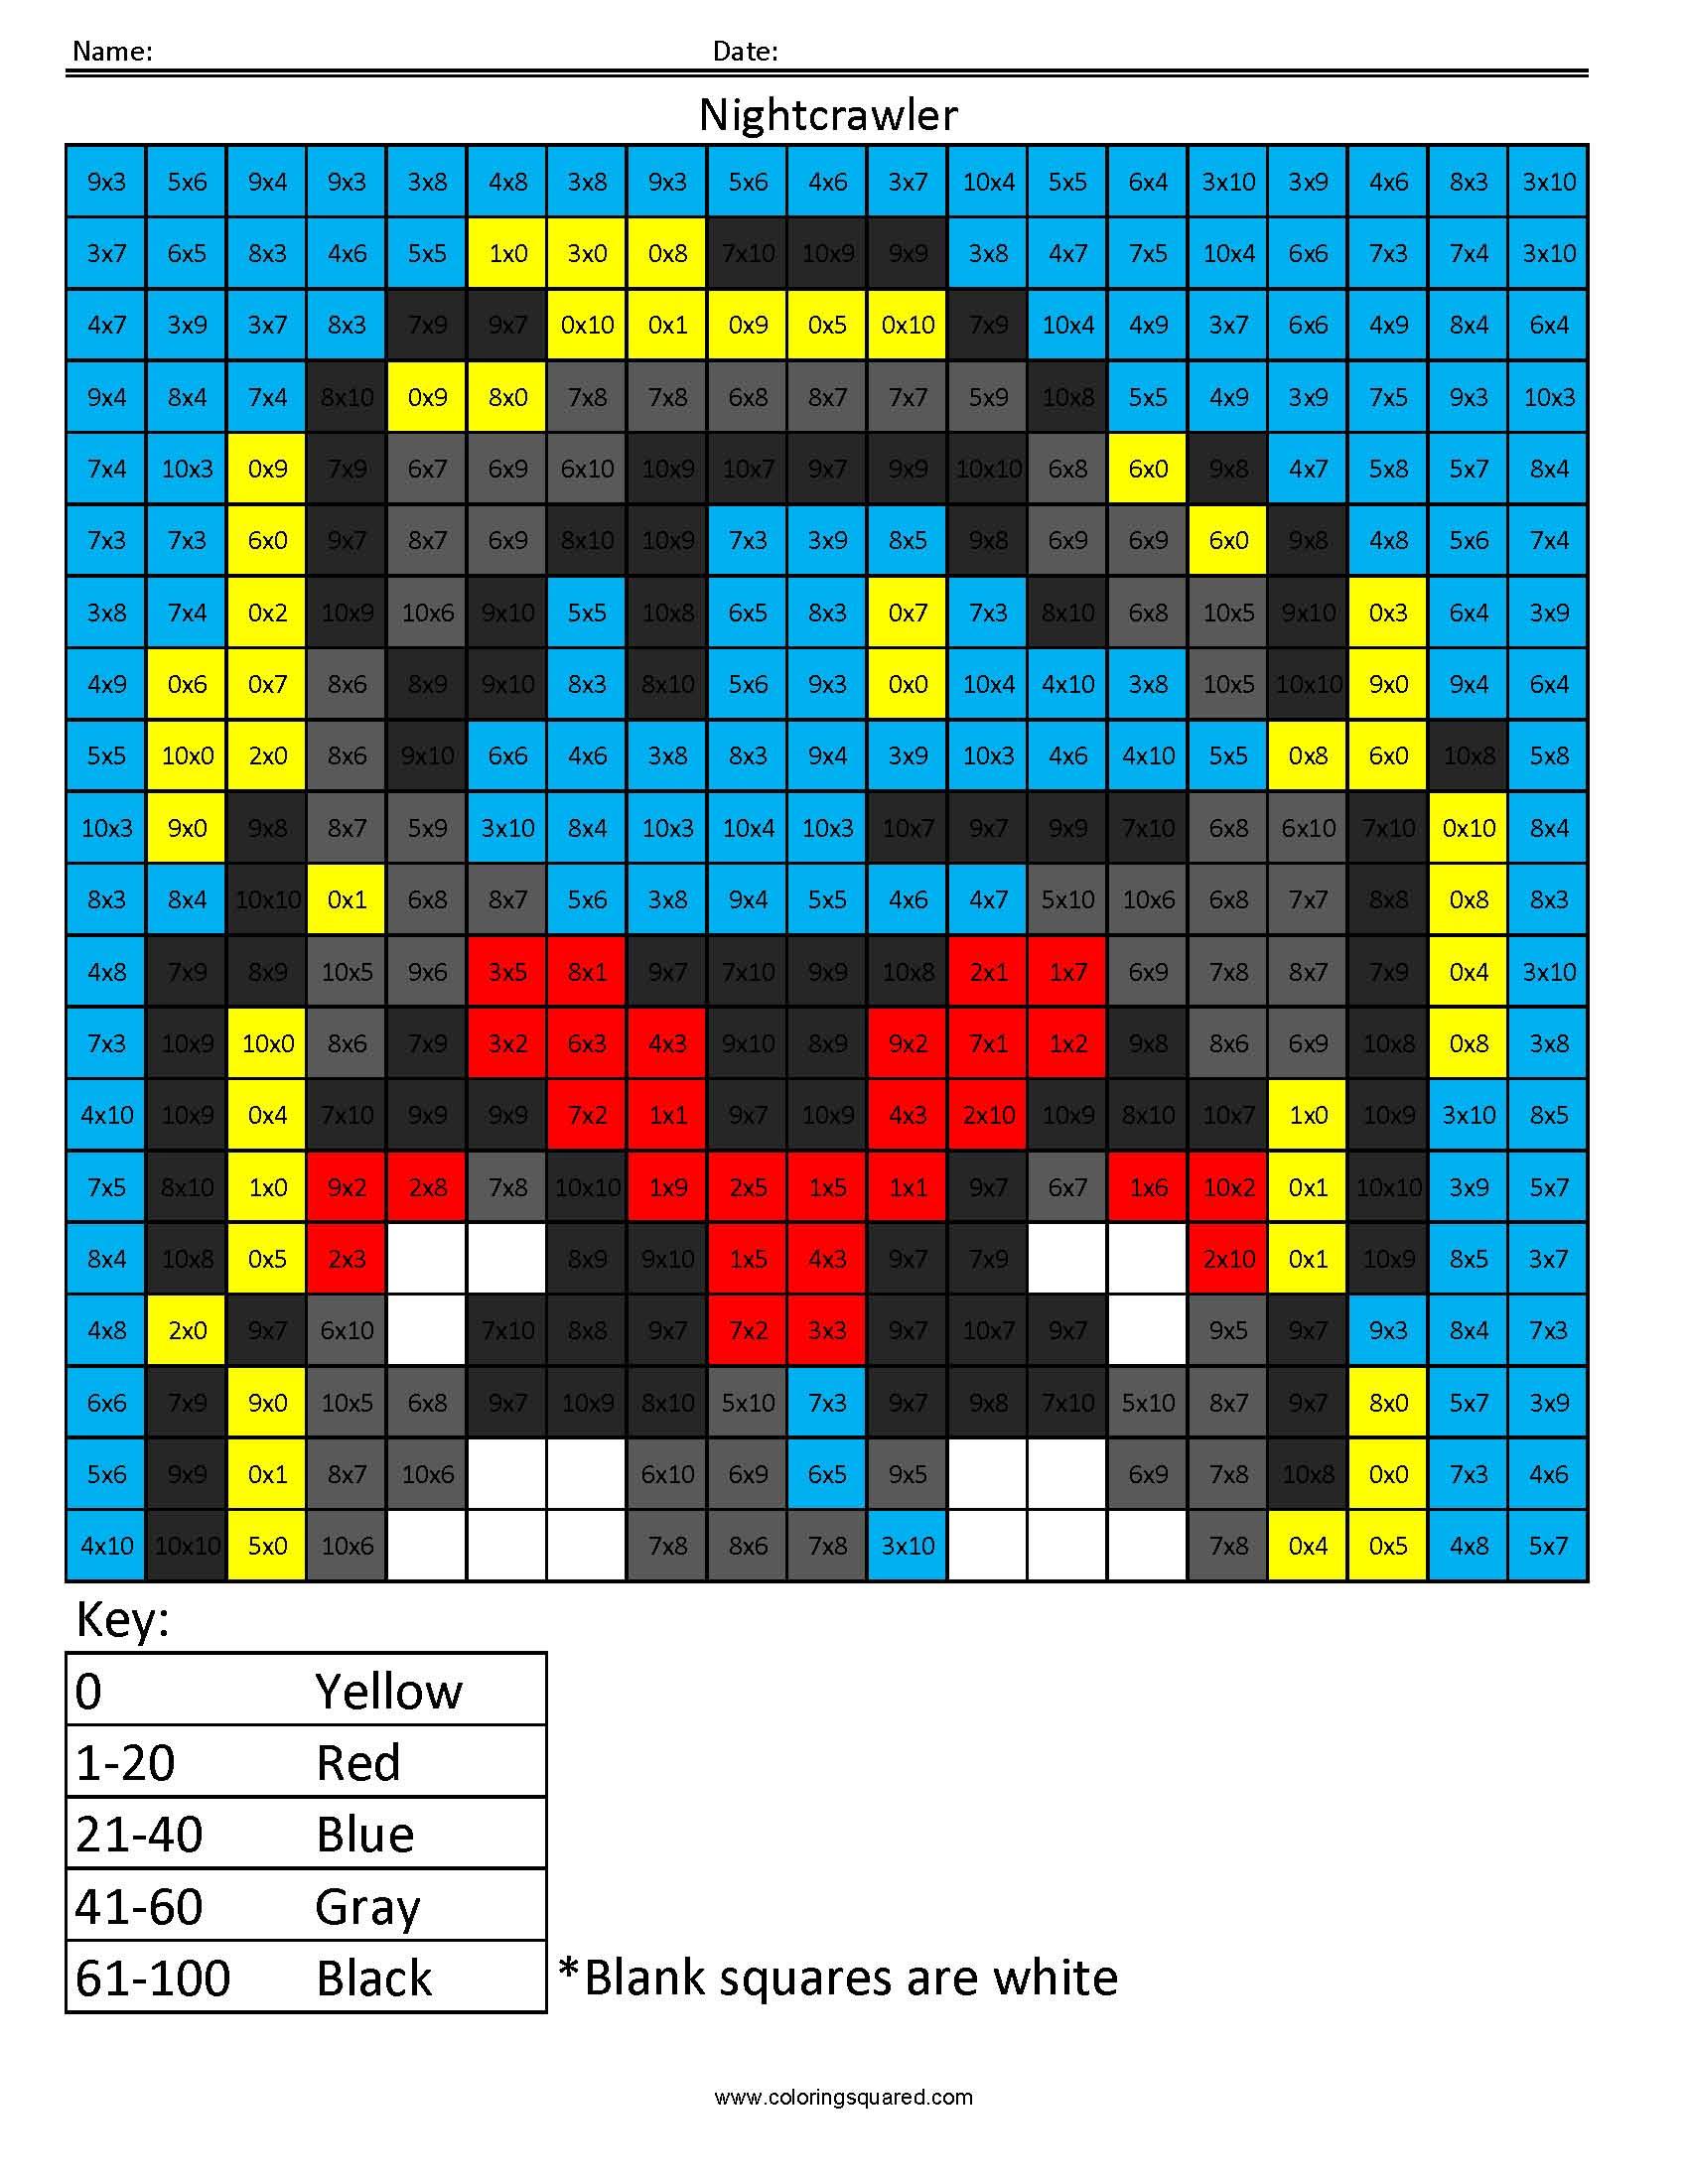 Nightcrawler Advanced Multiplication